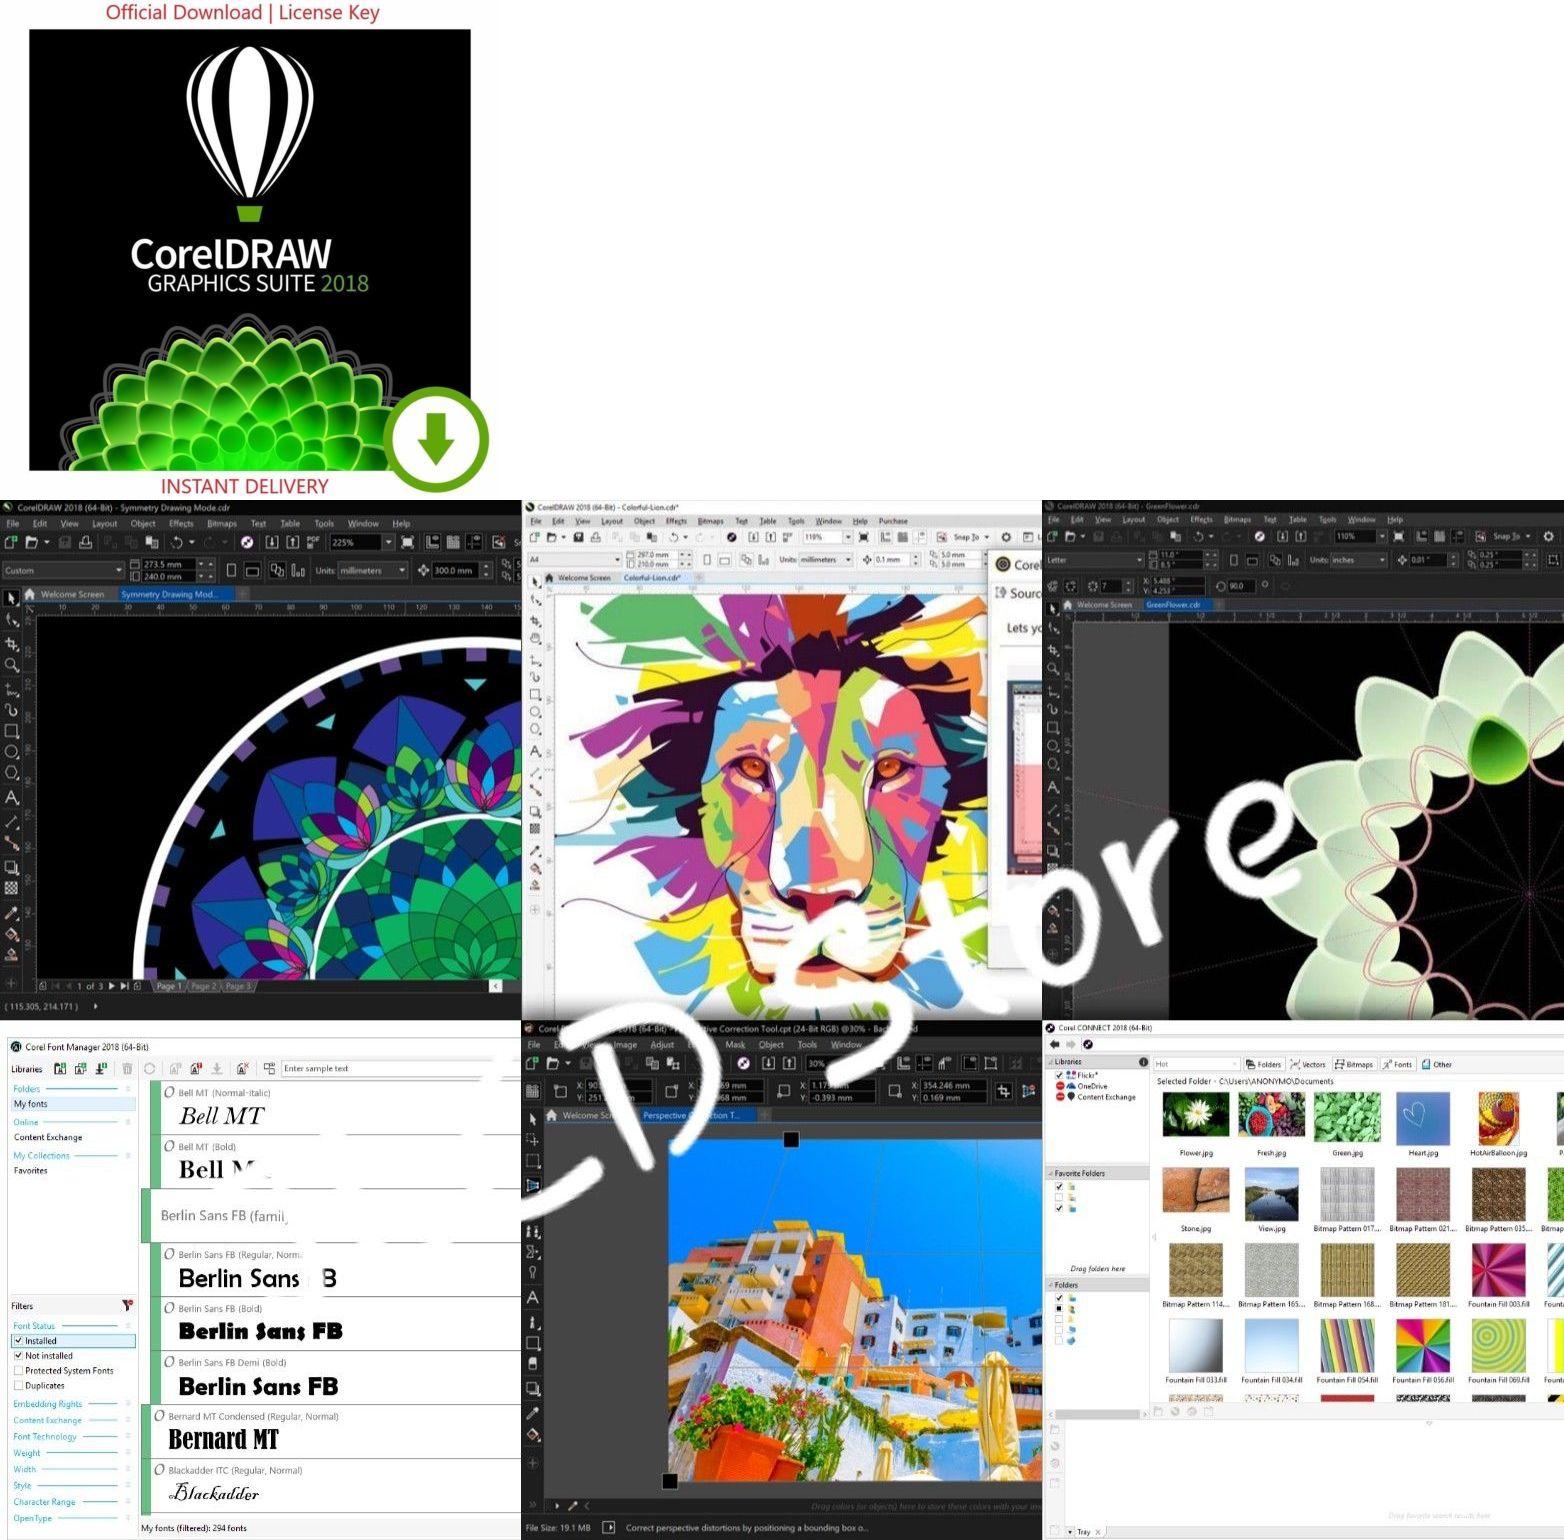 Coreldraw x8 graphics suite 2018 download | Coreldraw X8